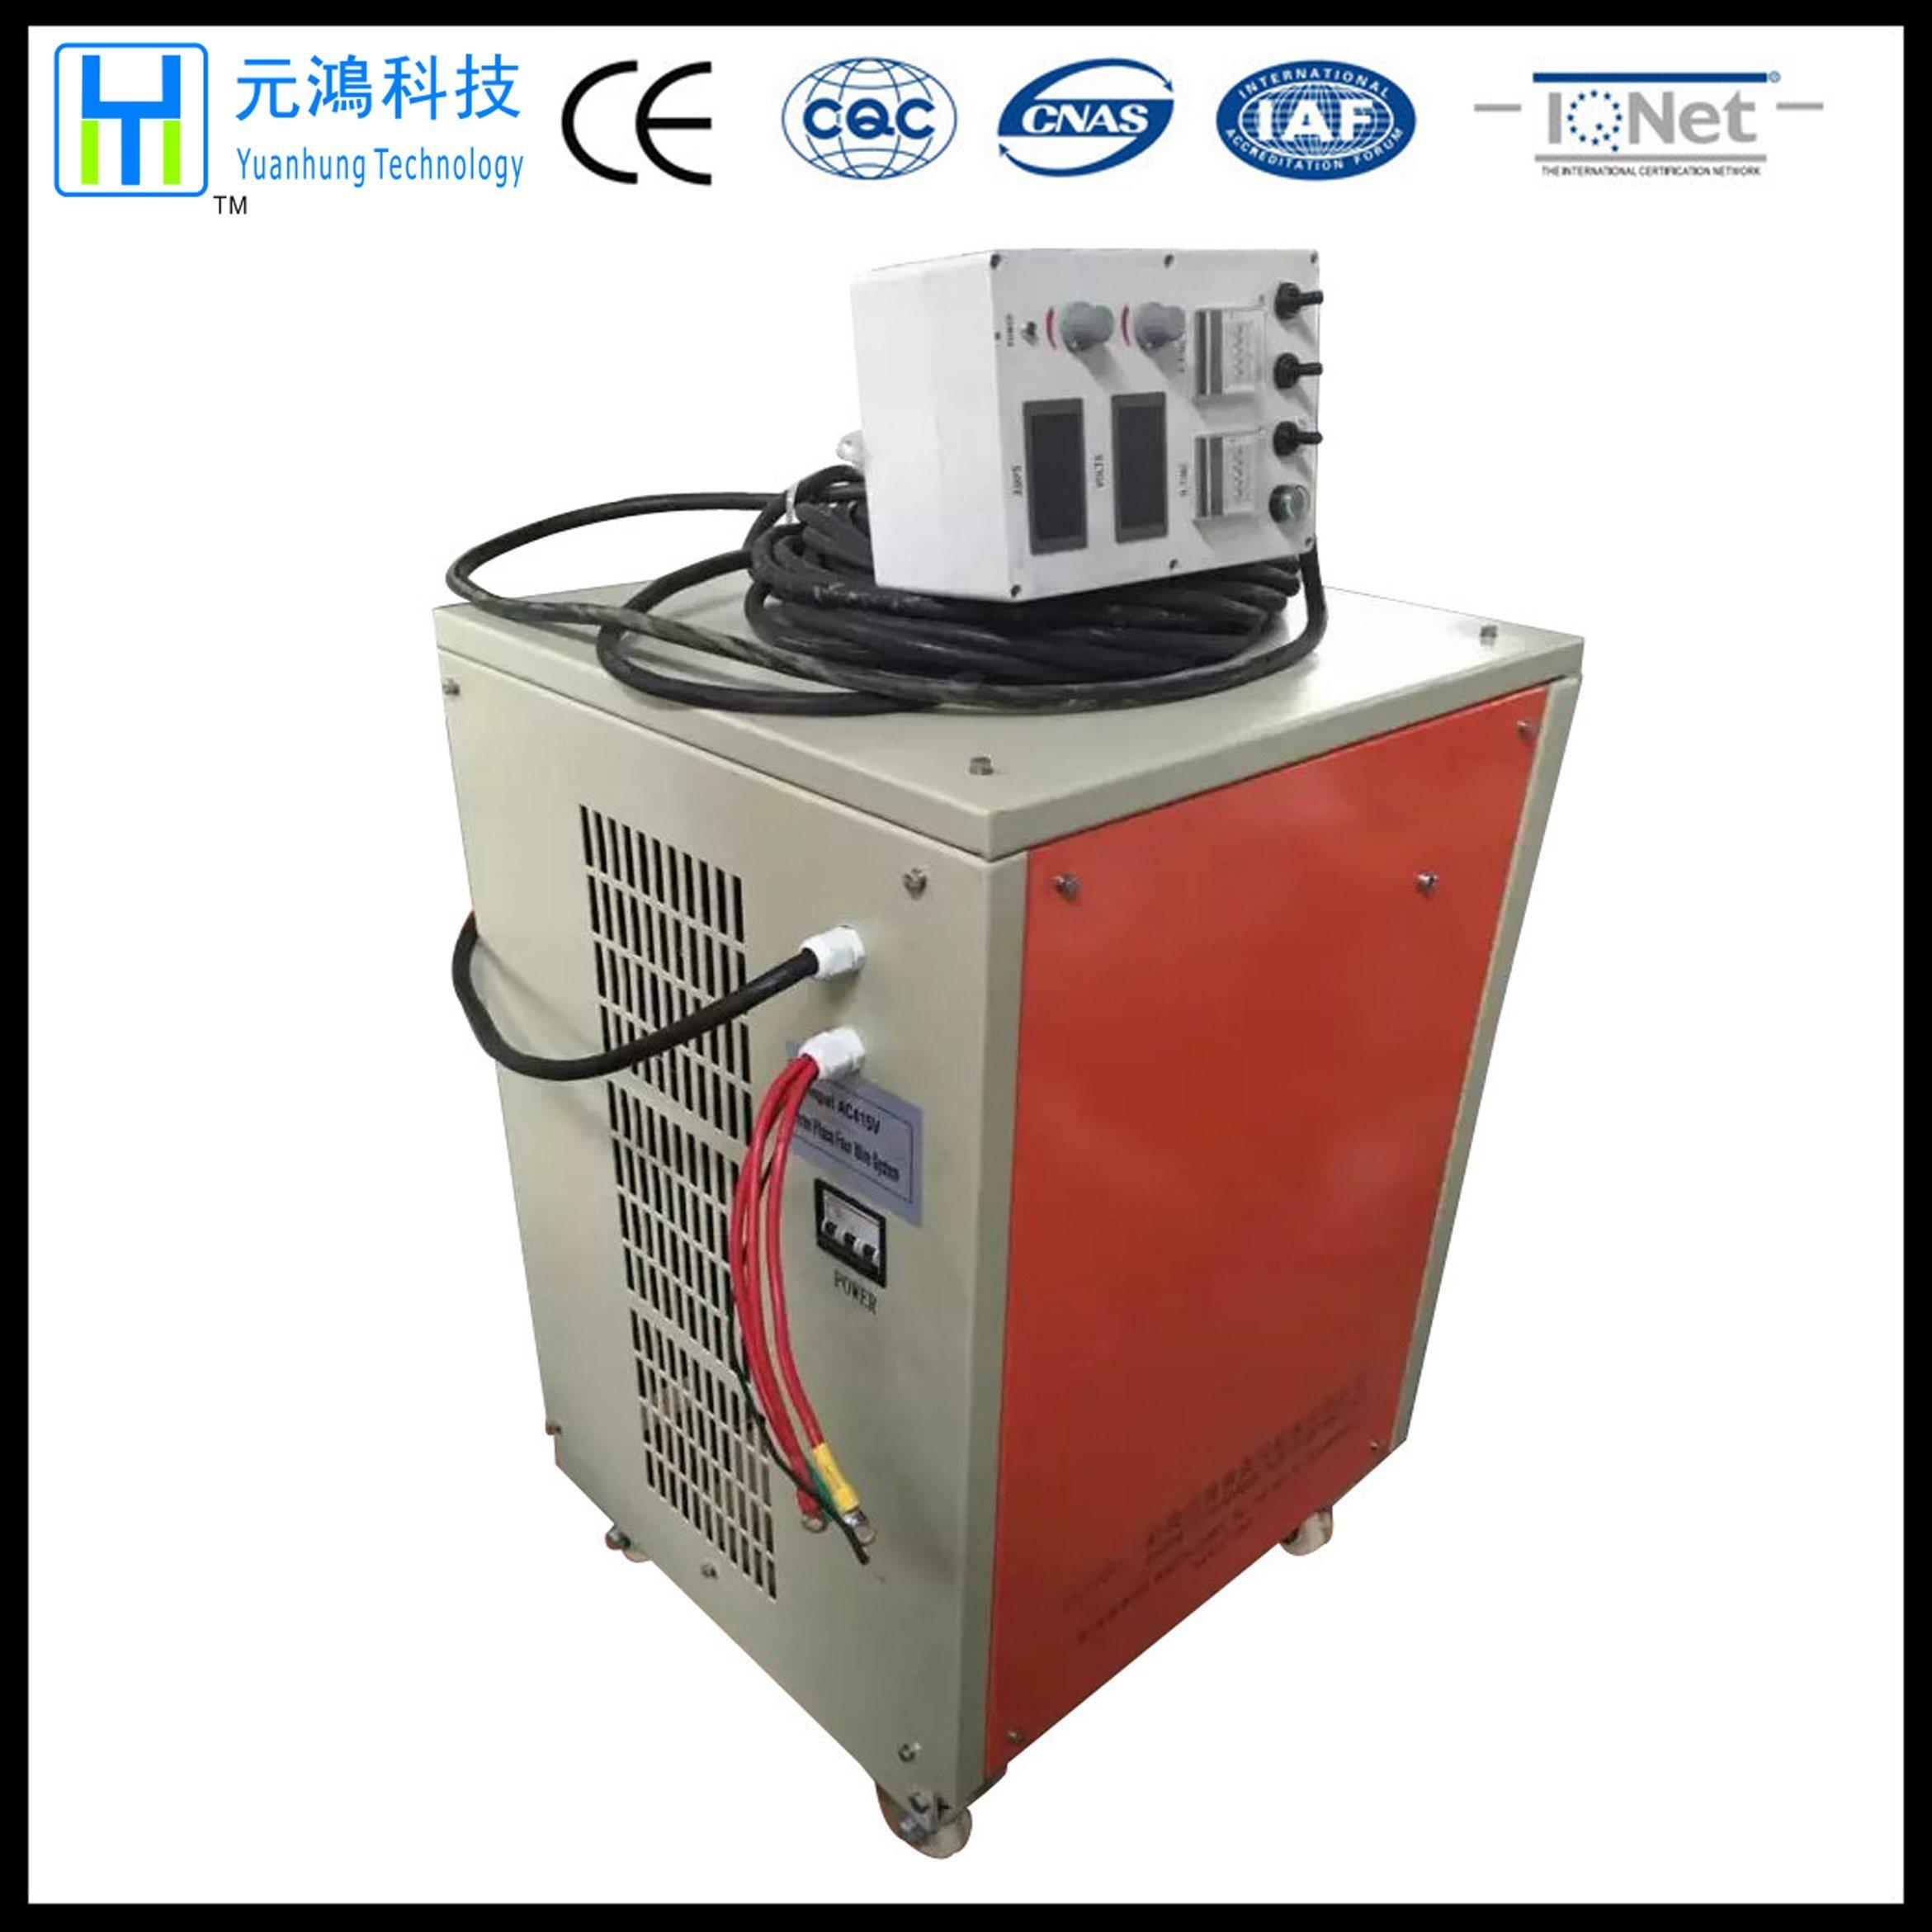 1500A 15V Polarity Periodic Reversing Electropolishing Rectifier